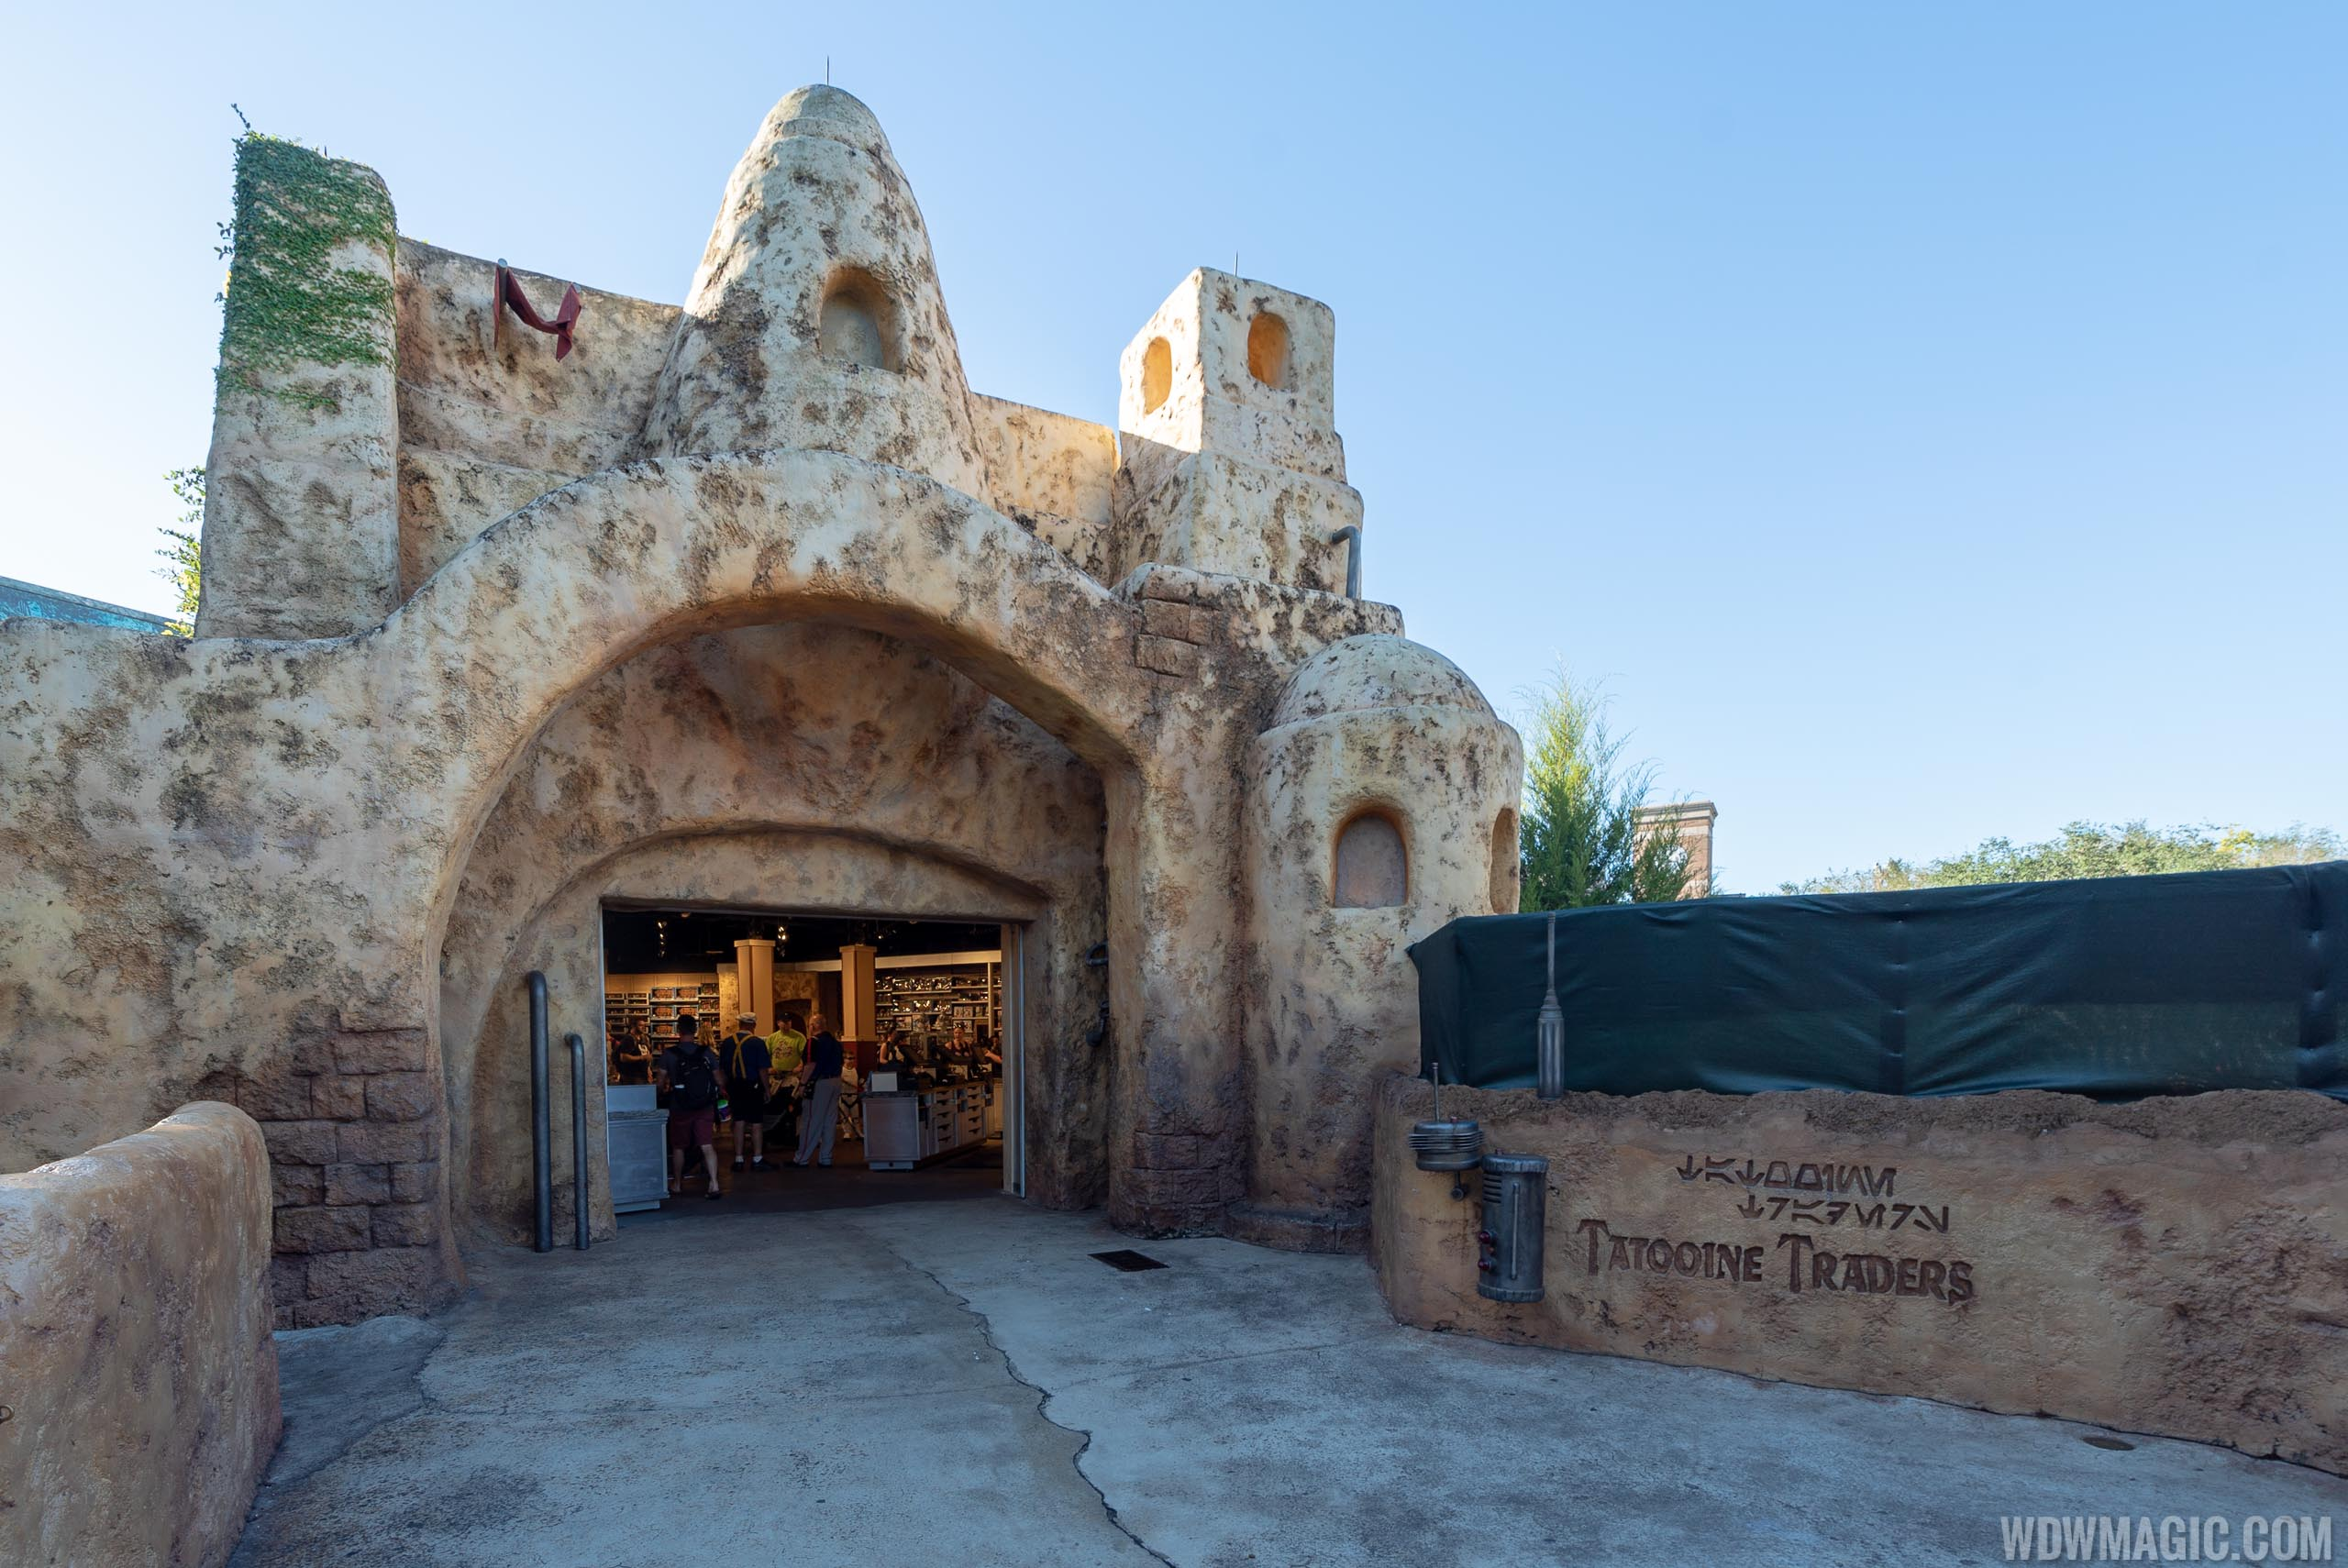 Tatooine Traders refurbishment